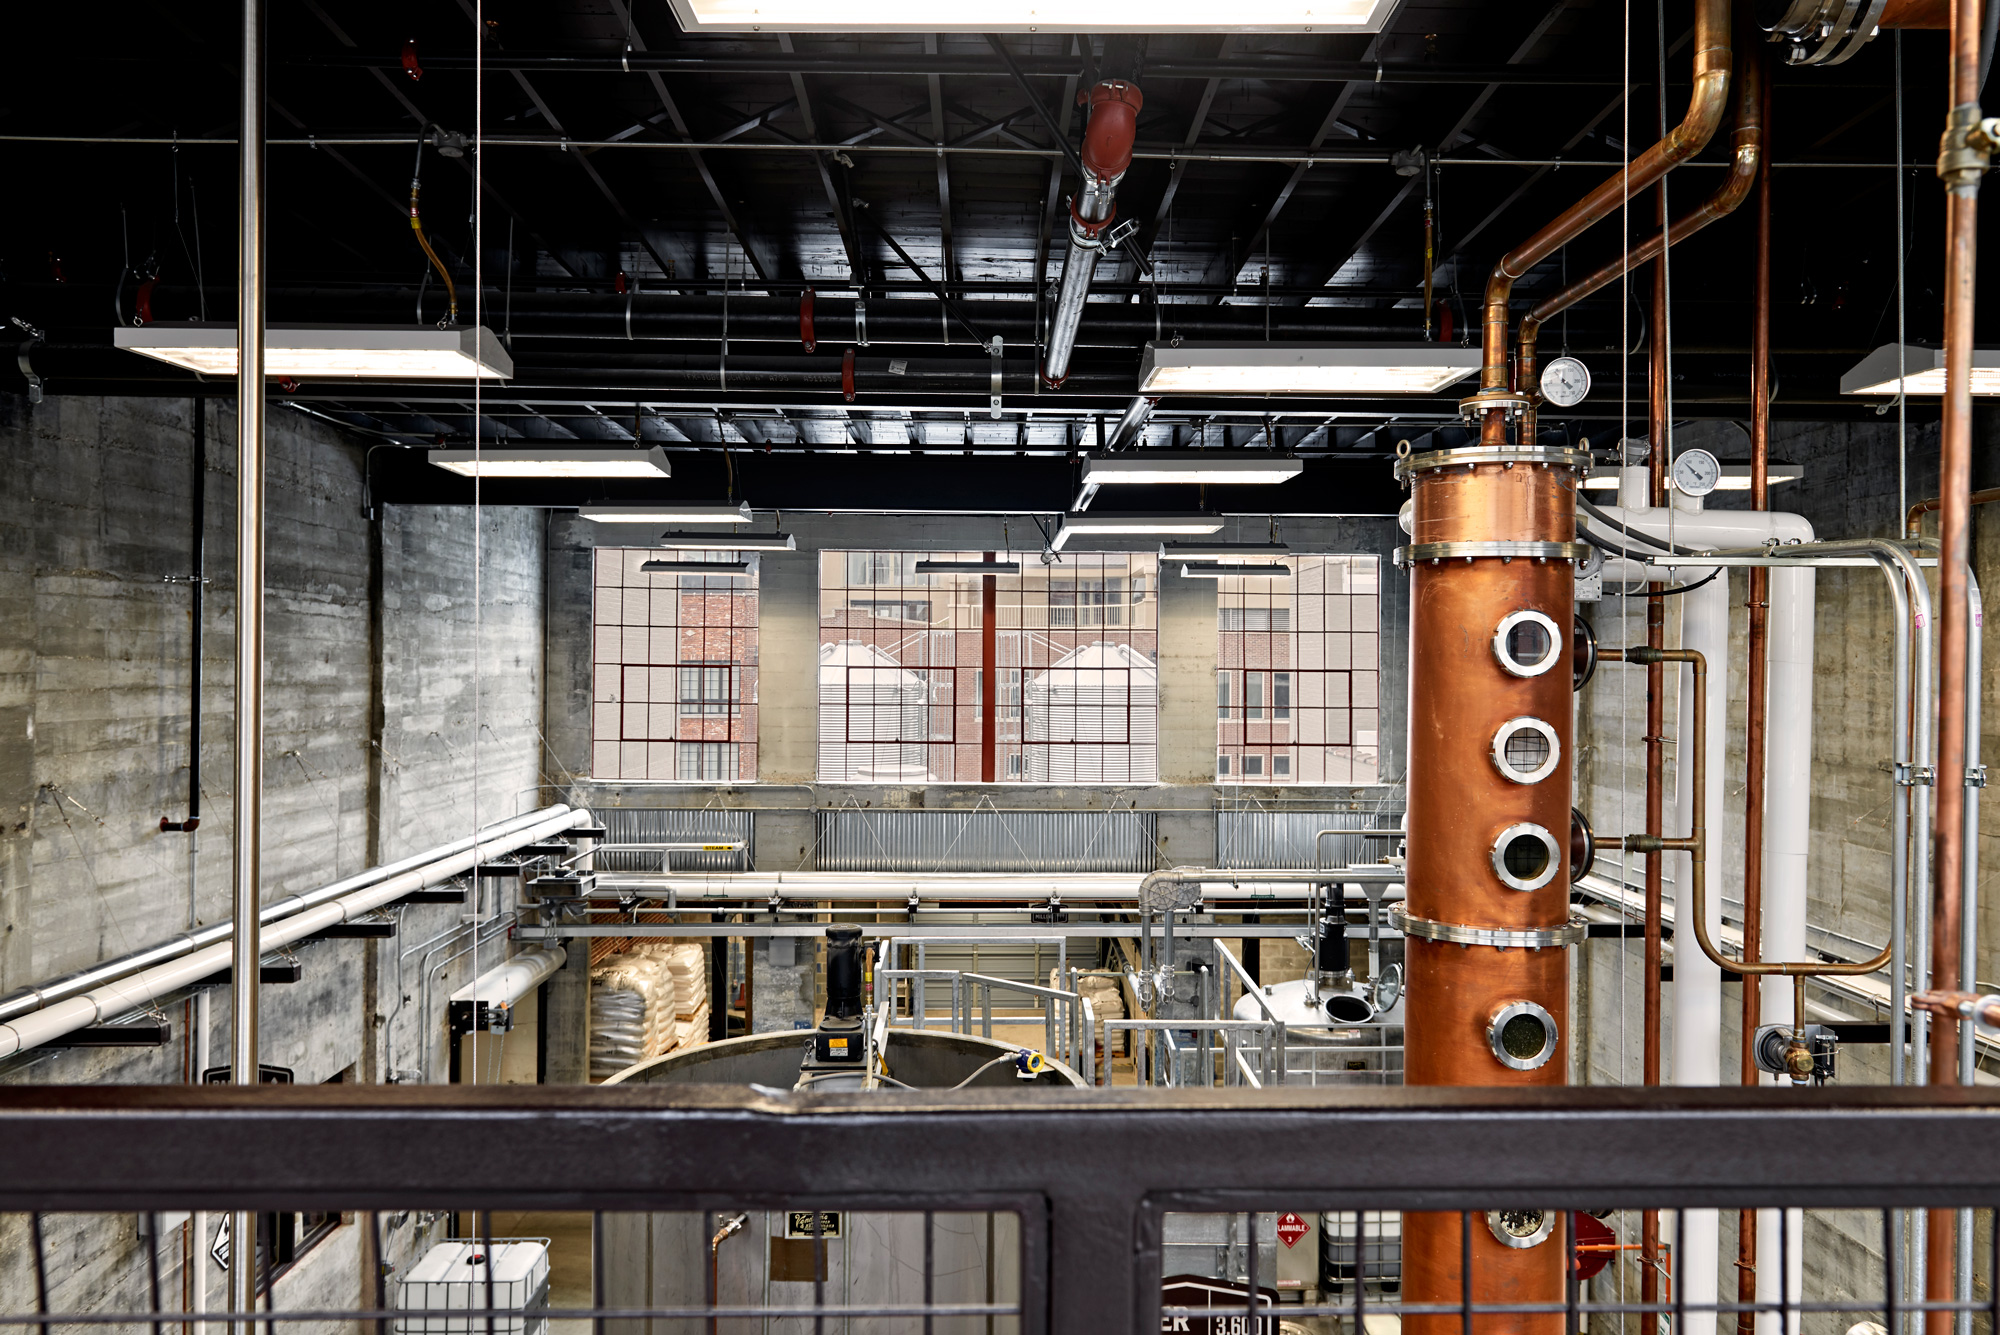 McGinn-Photography-Old-Dominick-Distillary-Memphis-Shot-11R.web.jpg